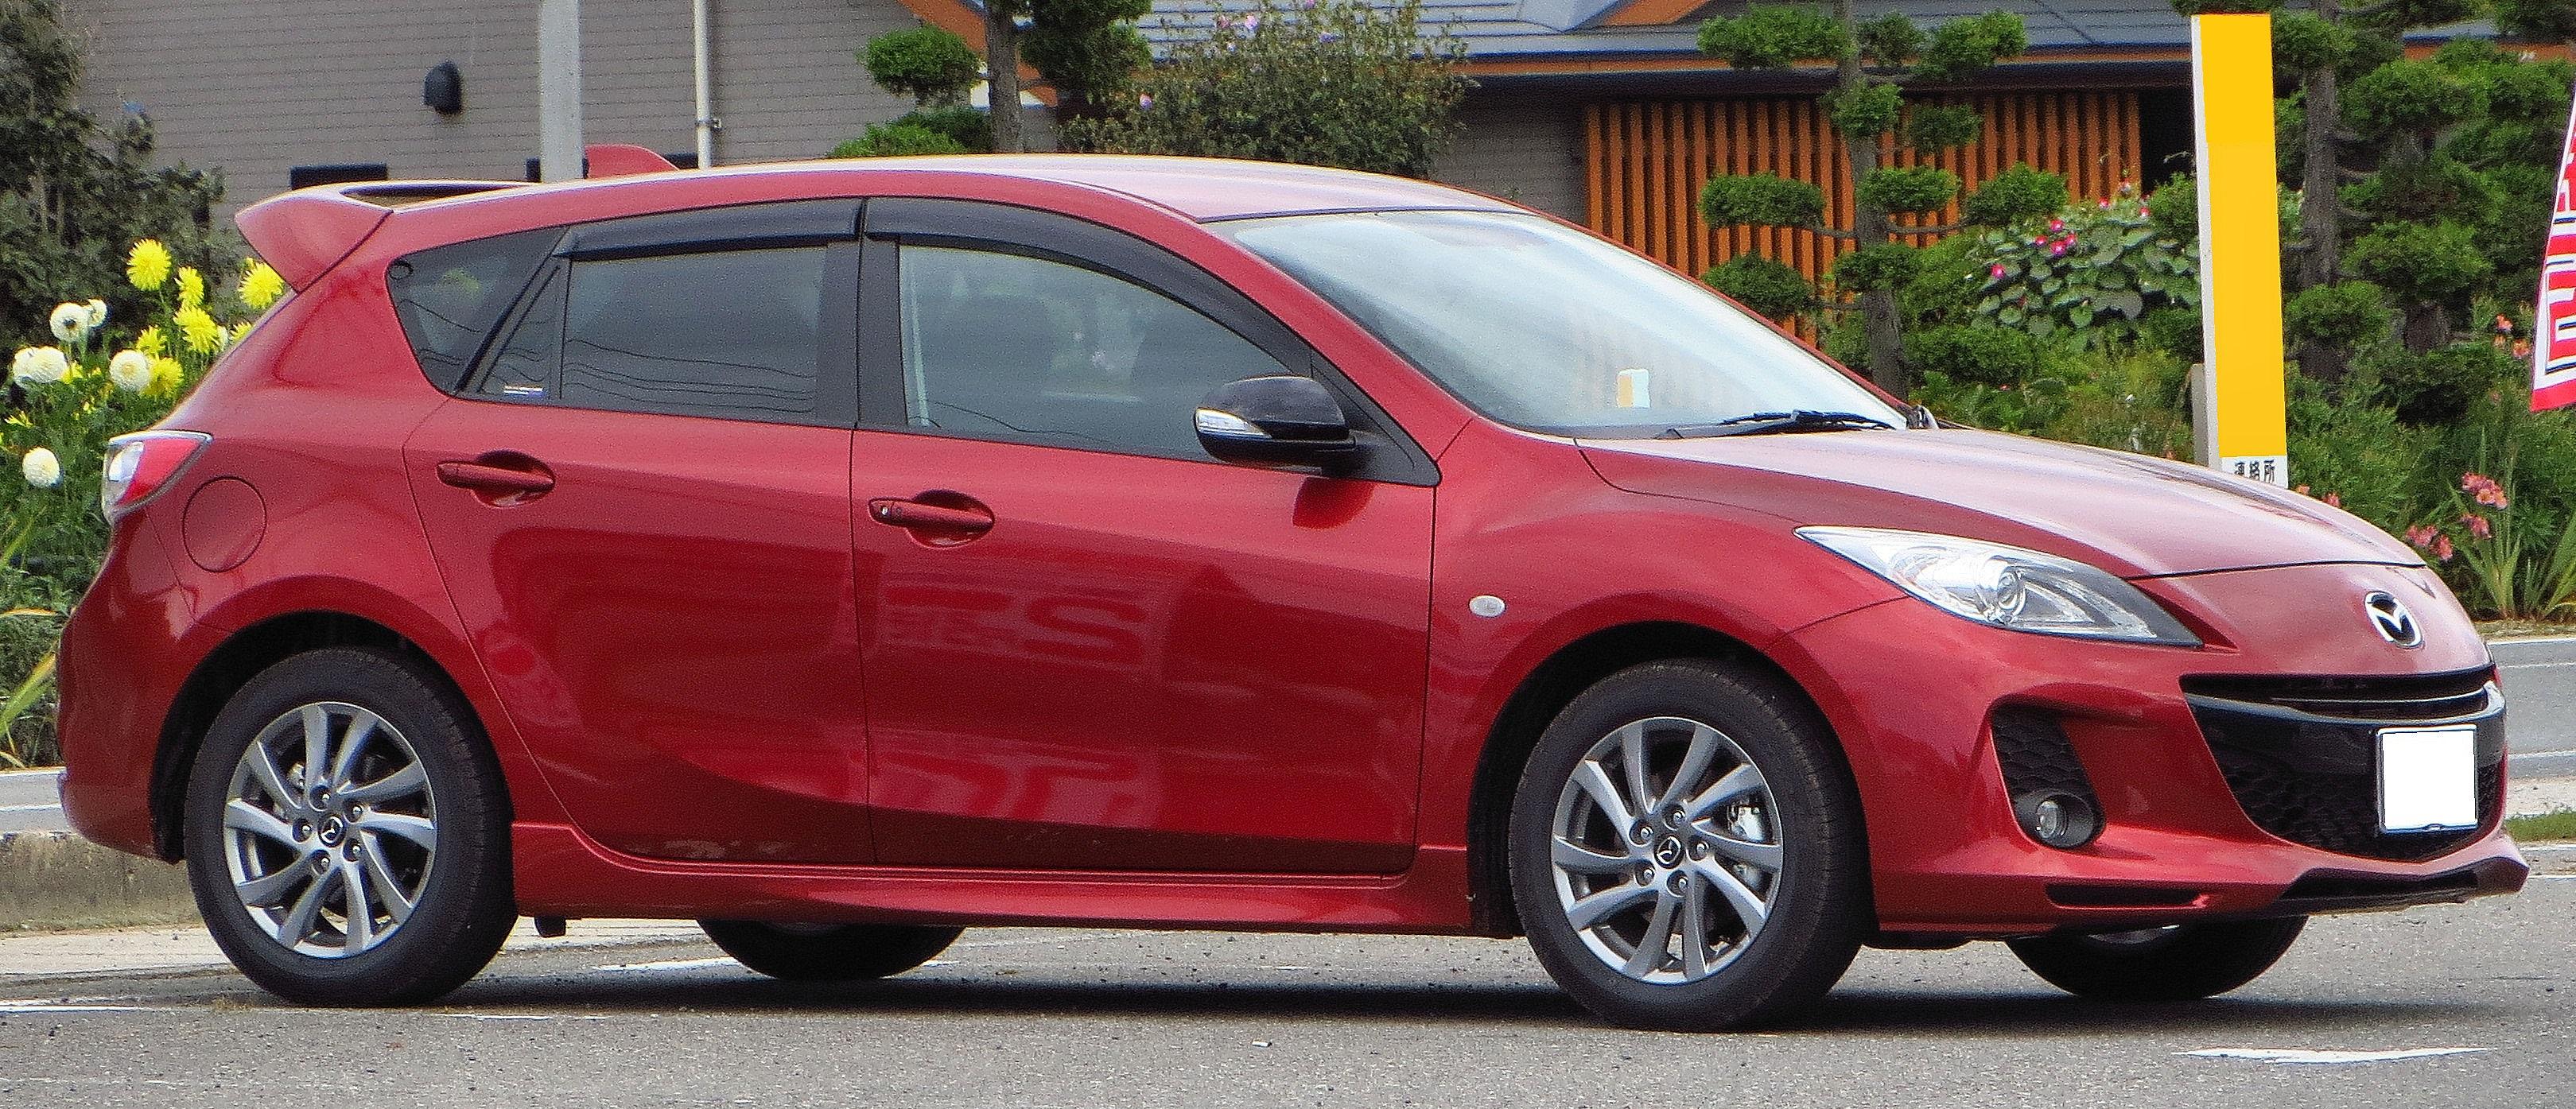 File:Mazda Axela 15S Sport Edition BL5FW.JPG - Wikimedia ...